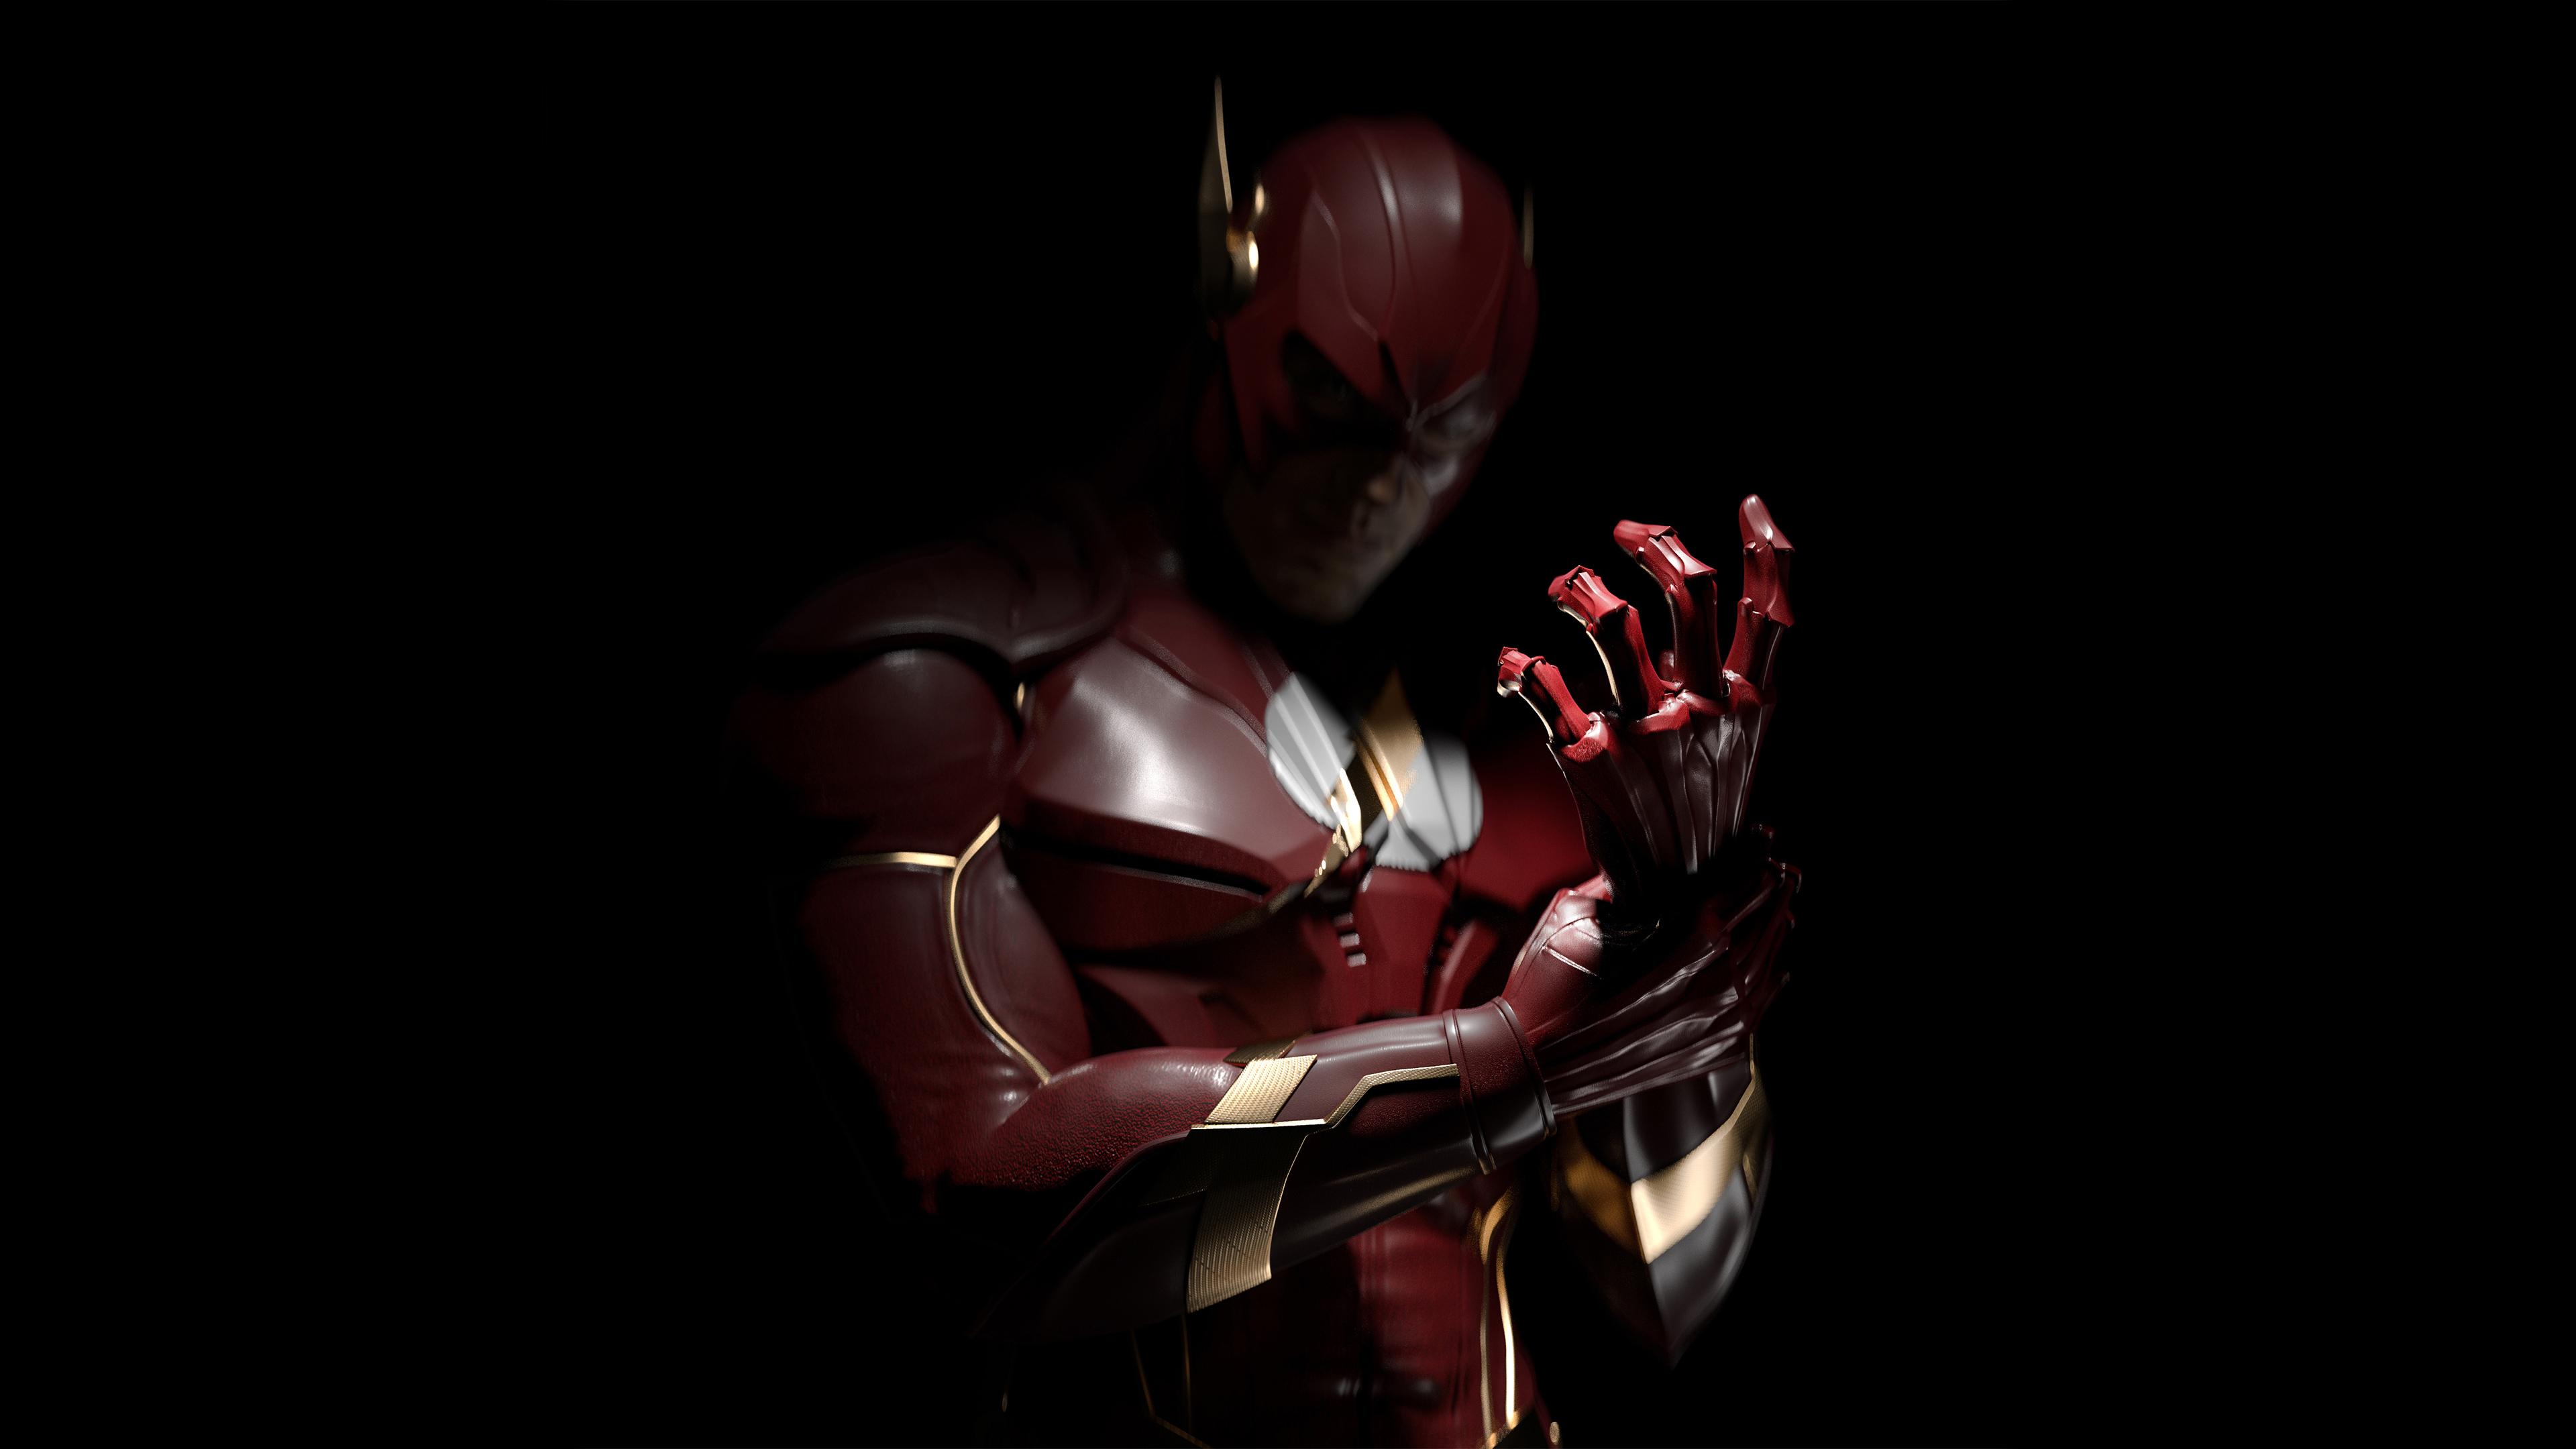 Flash Injustice 2, HD Superheroes, 4k Wallpapers, Images ...